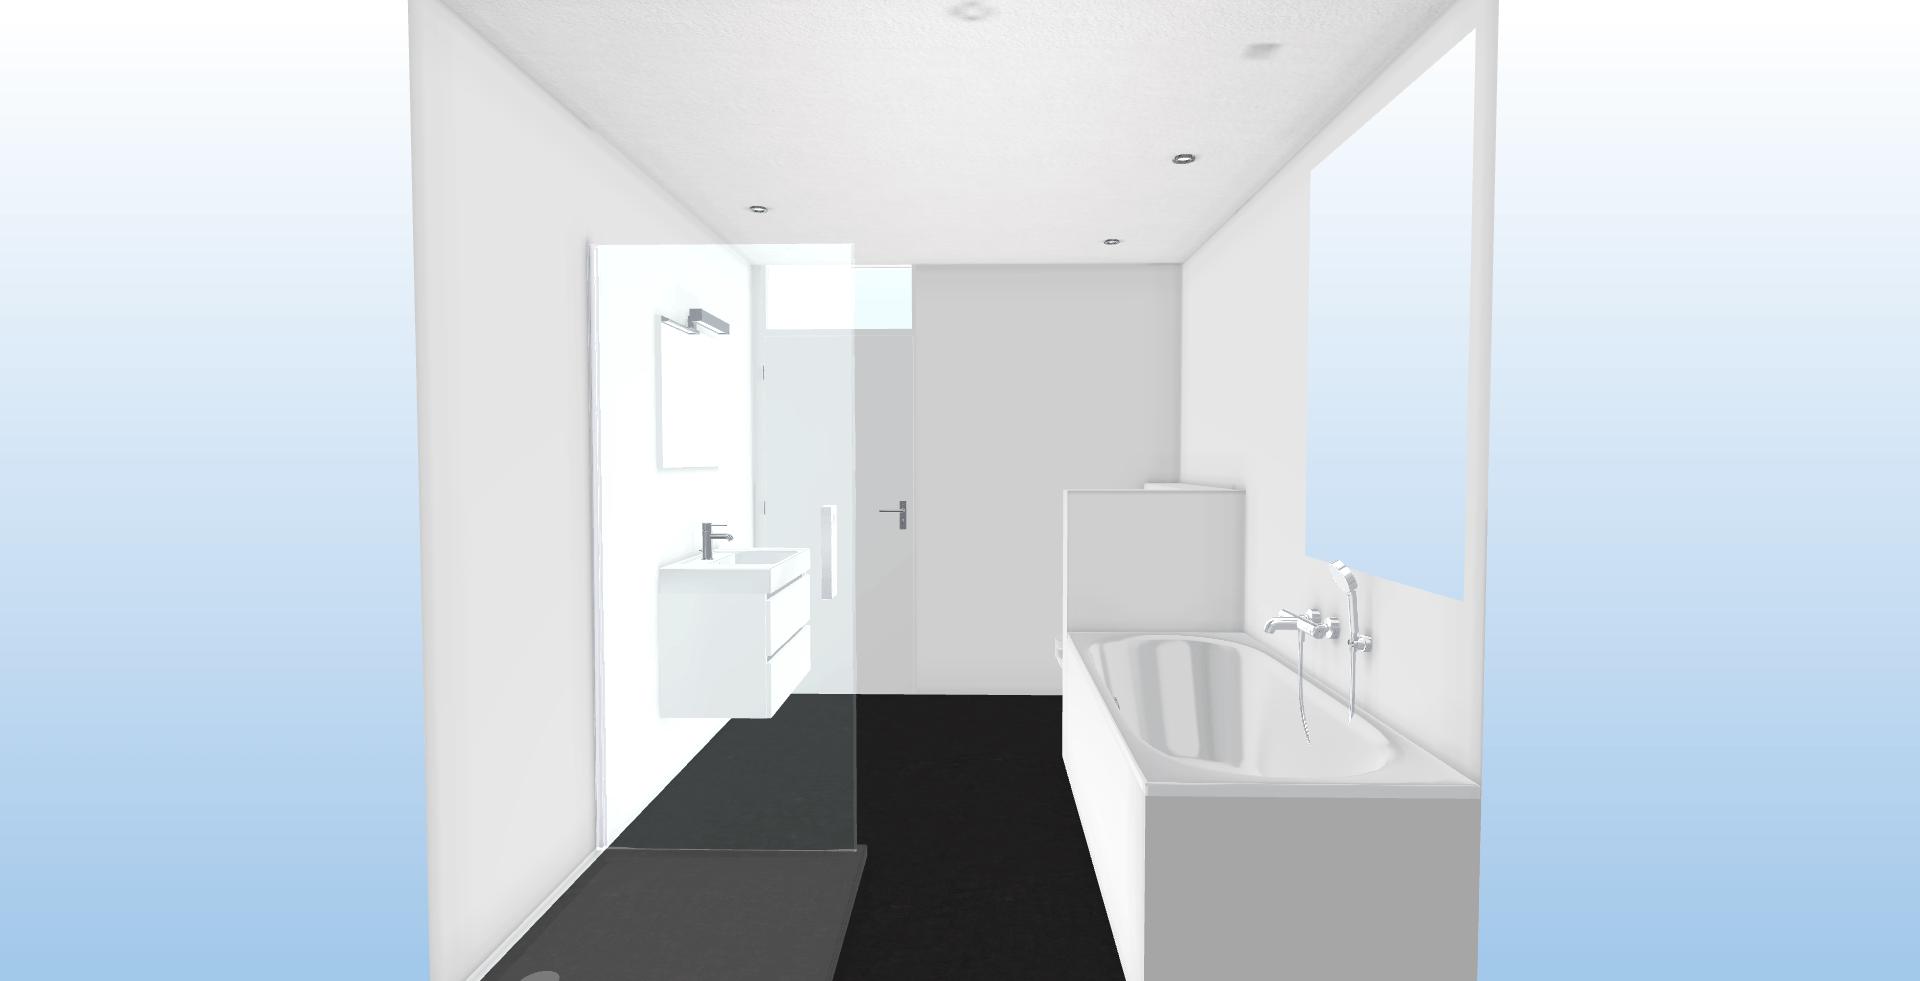 vierkante badkamer vooranzicht